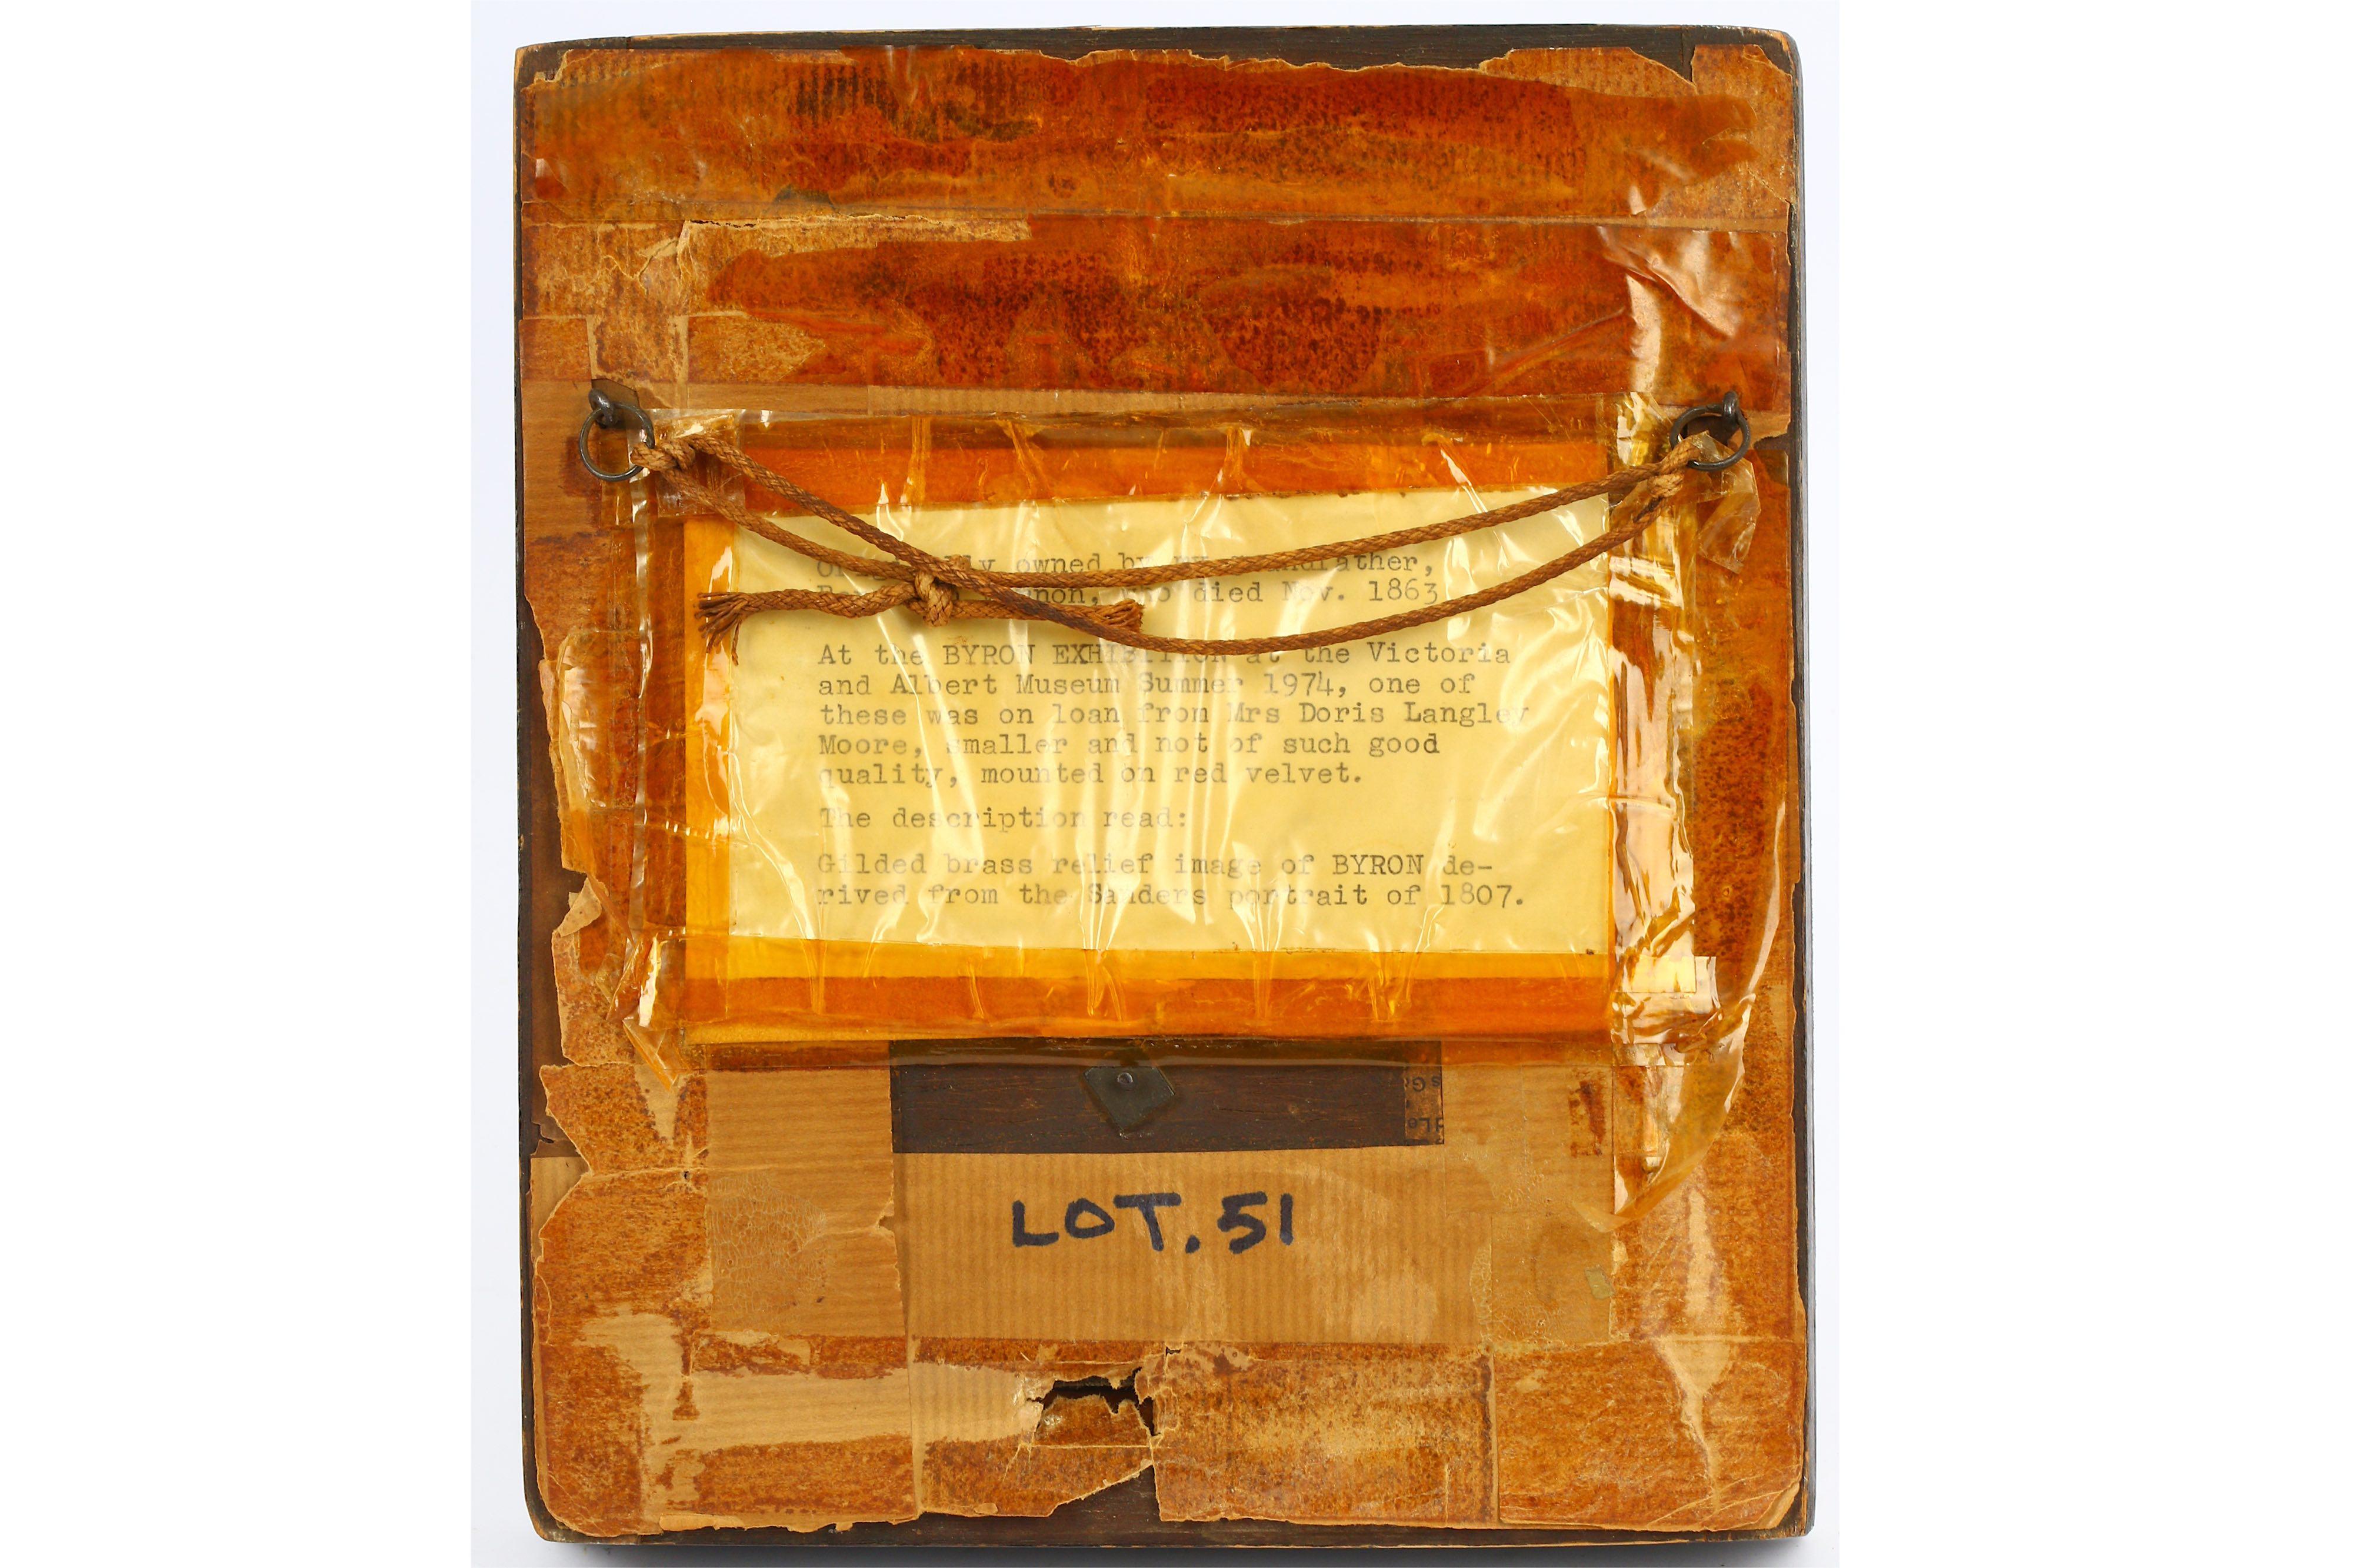 Lot 44 - A GILT BRONZE RELIEF PLAQUE OF BYRON